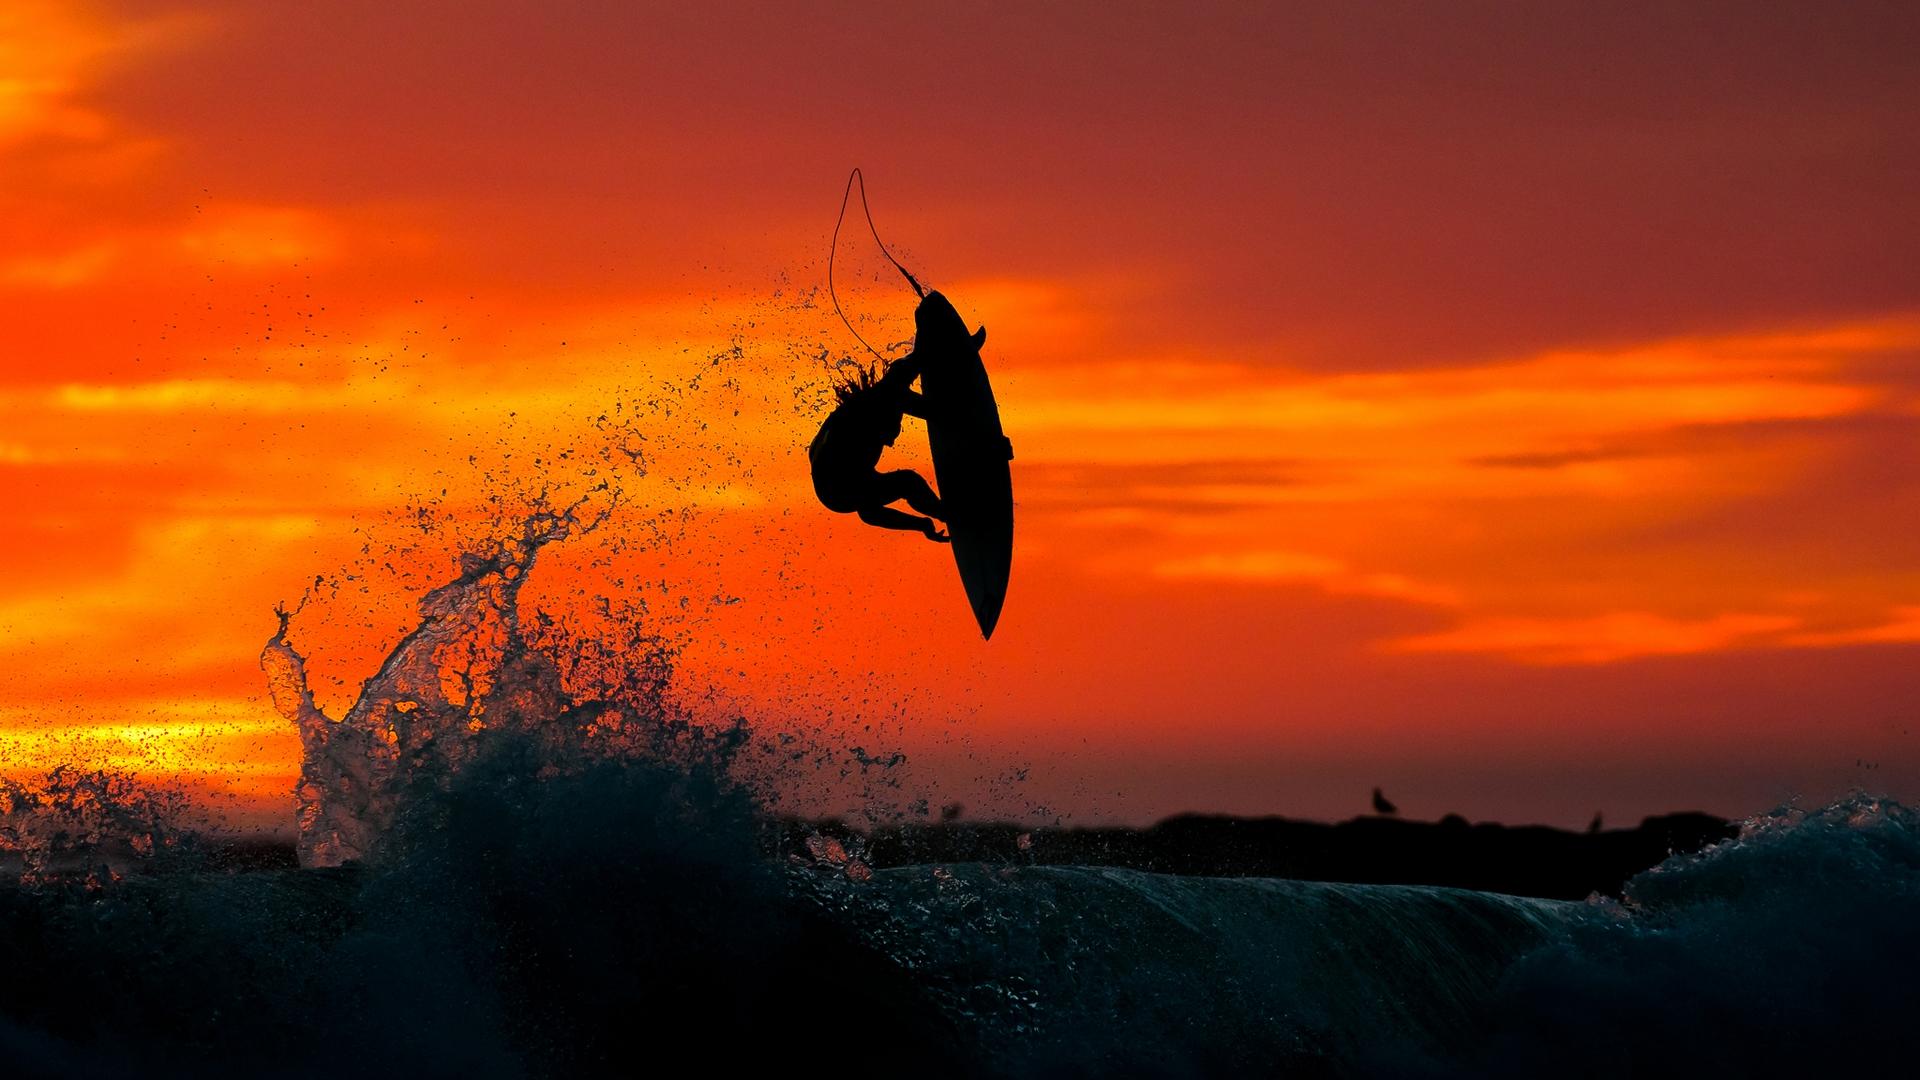 LG | G4 Surf Selfie